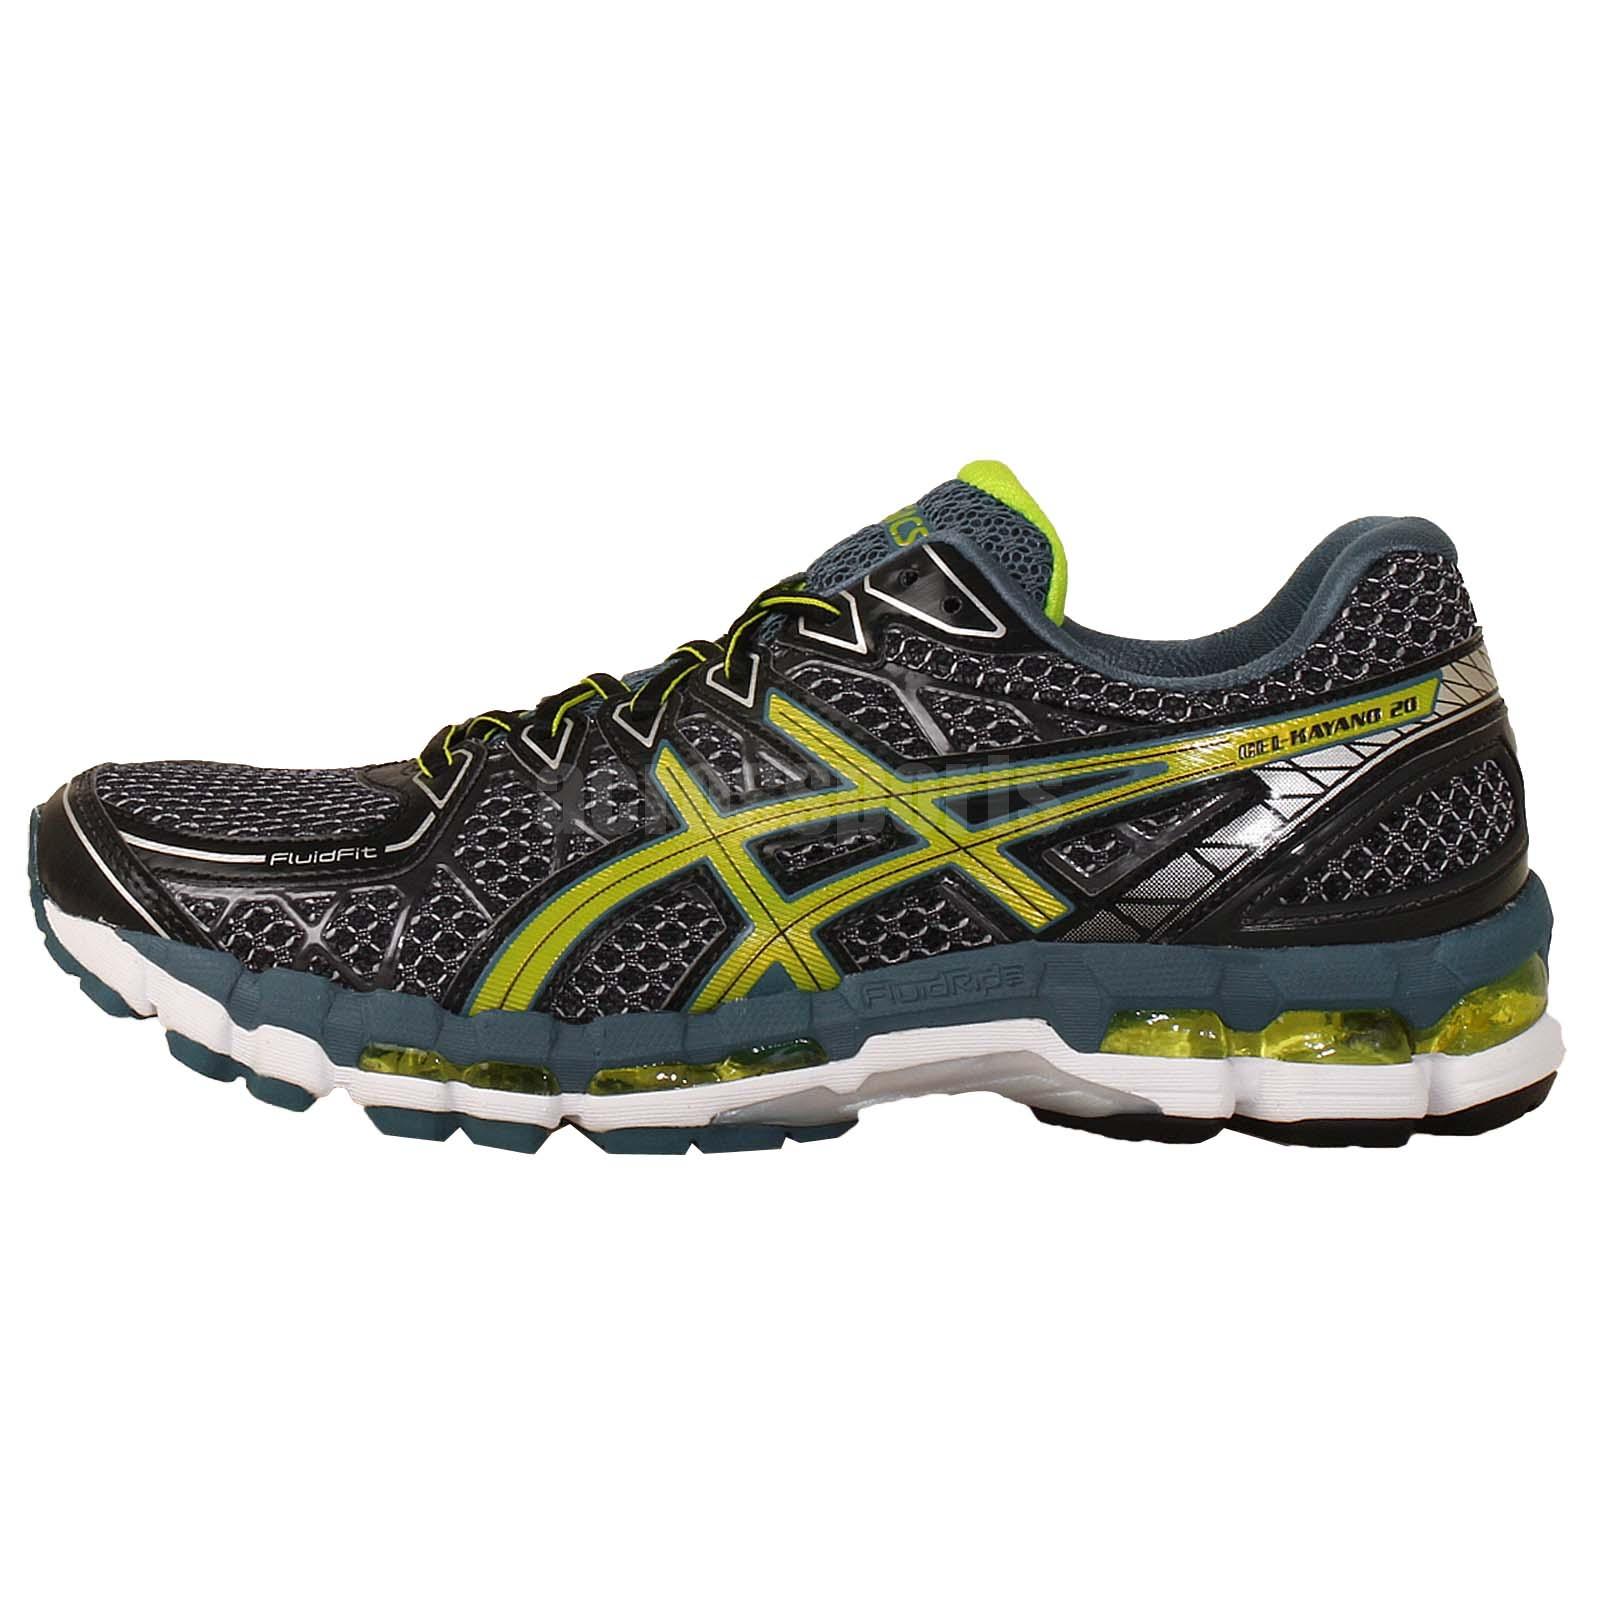 free shipping 8a8b5 63eae ... uk asics gel kayano 20 black green mens running jogging shoes trainers  t3n2n 9005 . 553a7